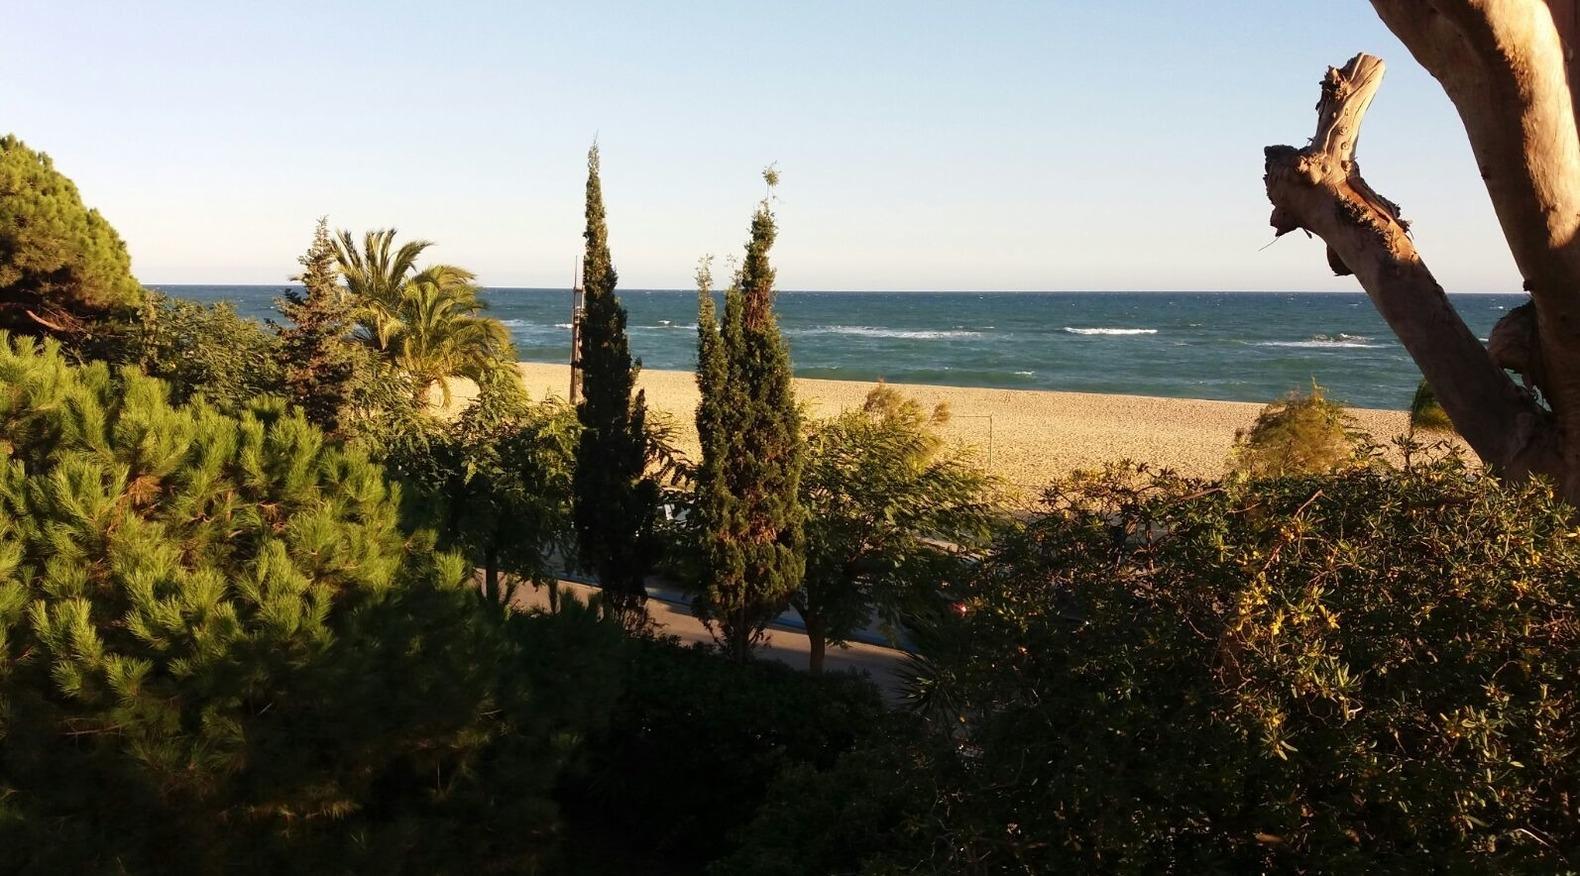 Ferienhaus Jugendstil Strandhaus (2626425), Caldes d'Estrac, Costa del Meresme, Katalonien, Spanien, Bild 12